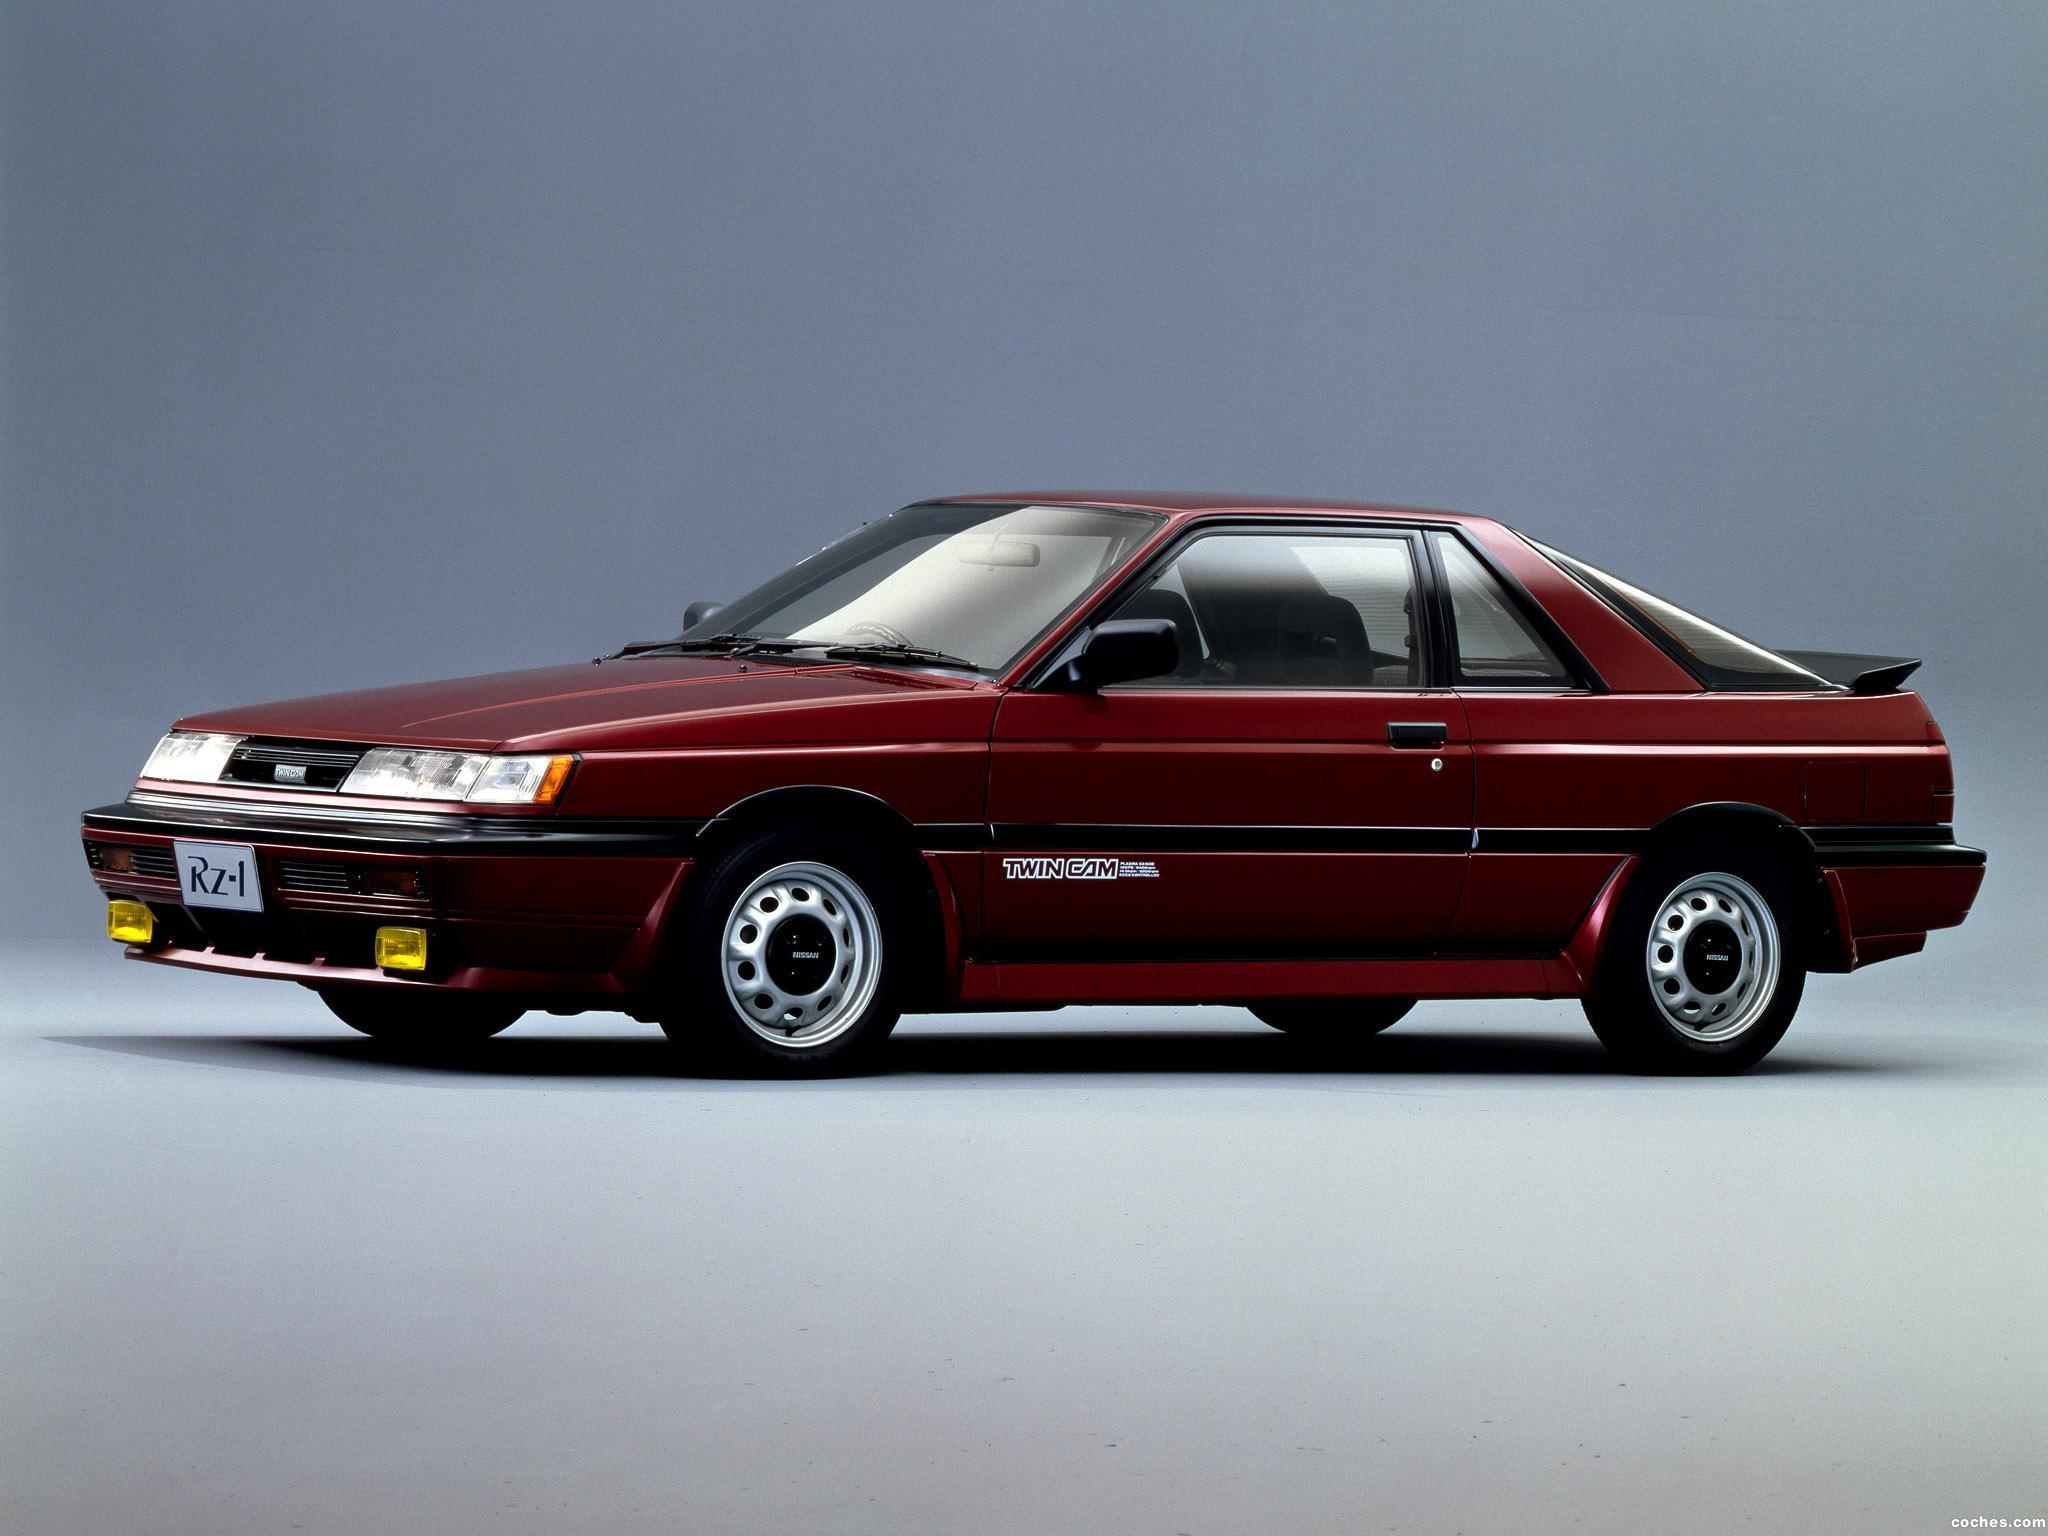 Fotos De Nissan Sunny Rz 1 Twin Cam 1986